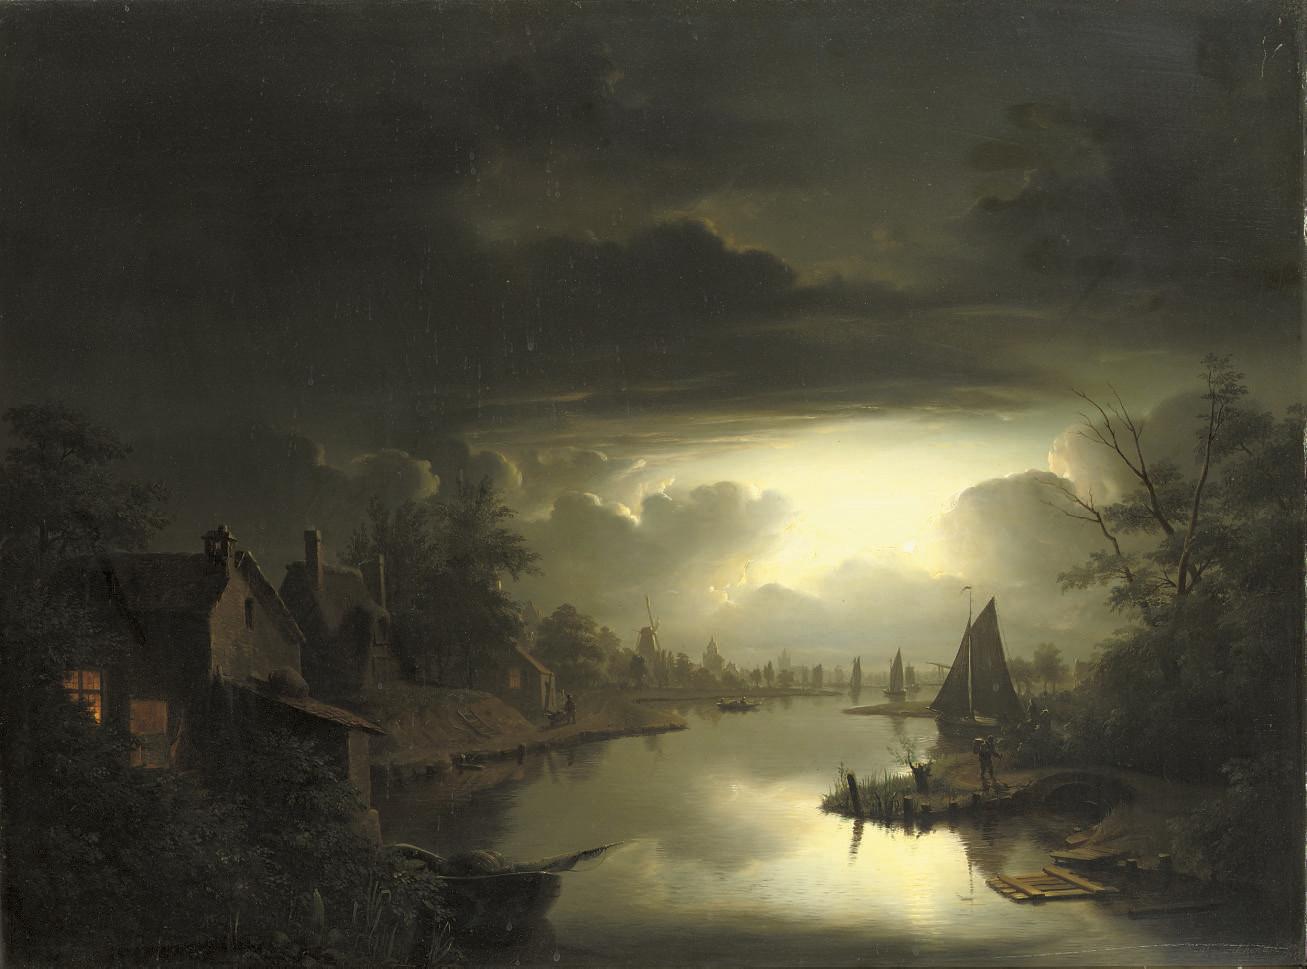 Maaneffect: a Dutch riverside-town by nightfall